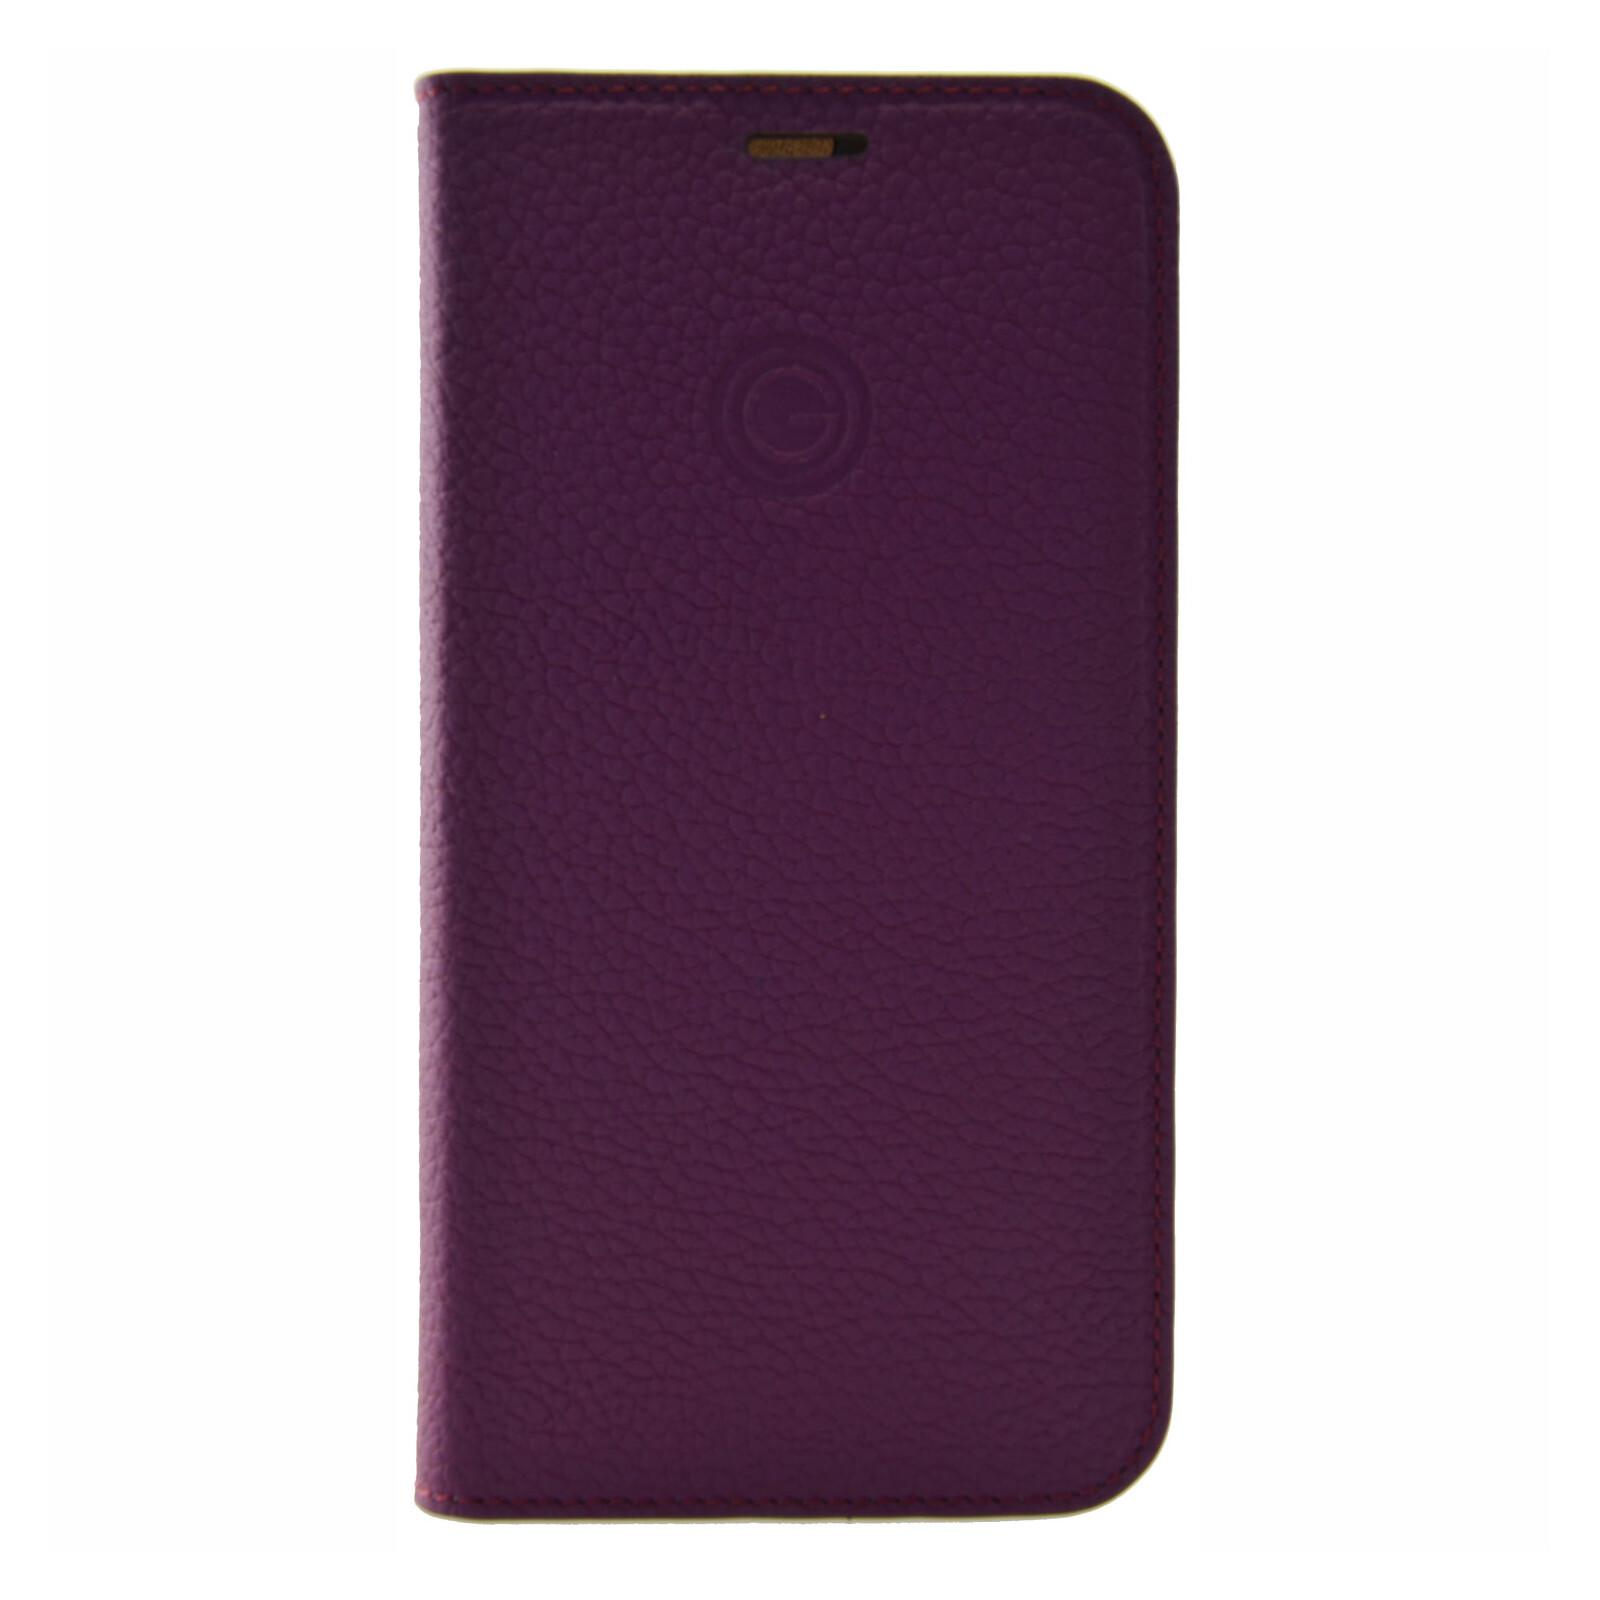 Galeli Booktasche MARC Apple iPhone 12 Max/Pro viola